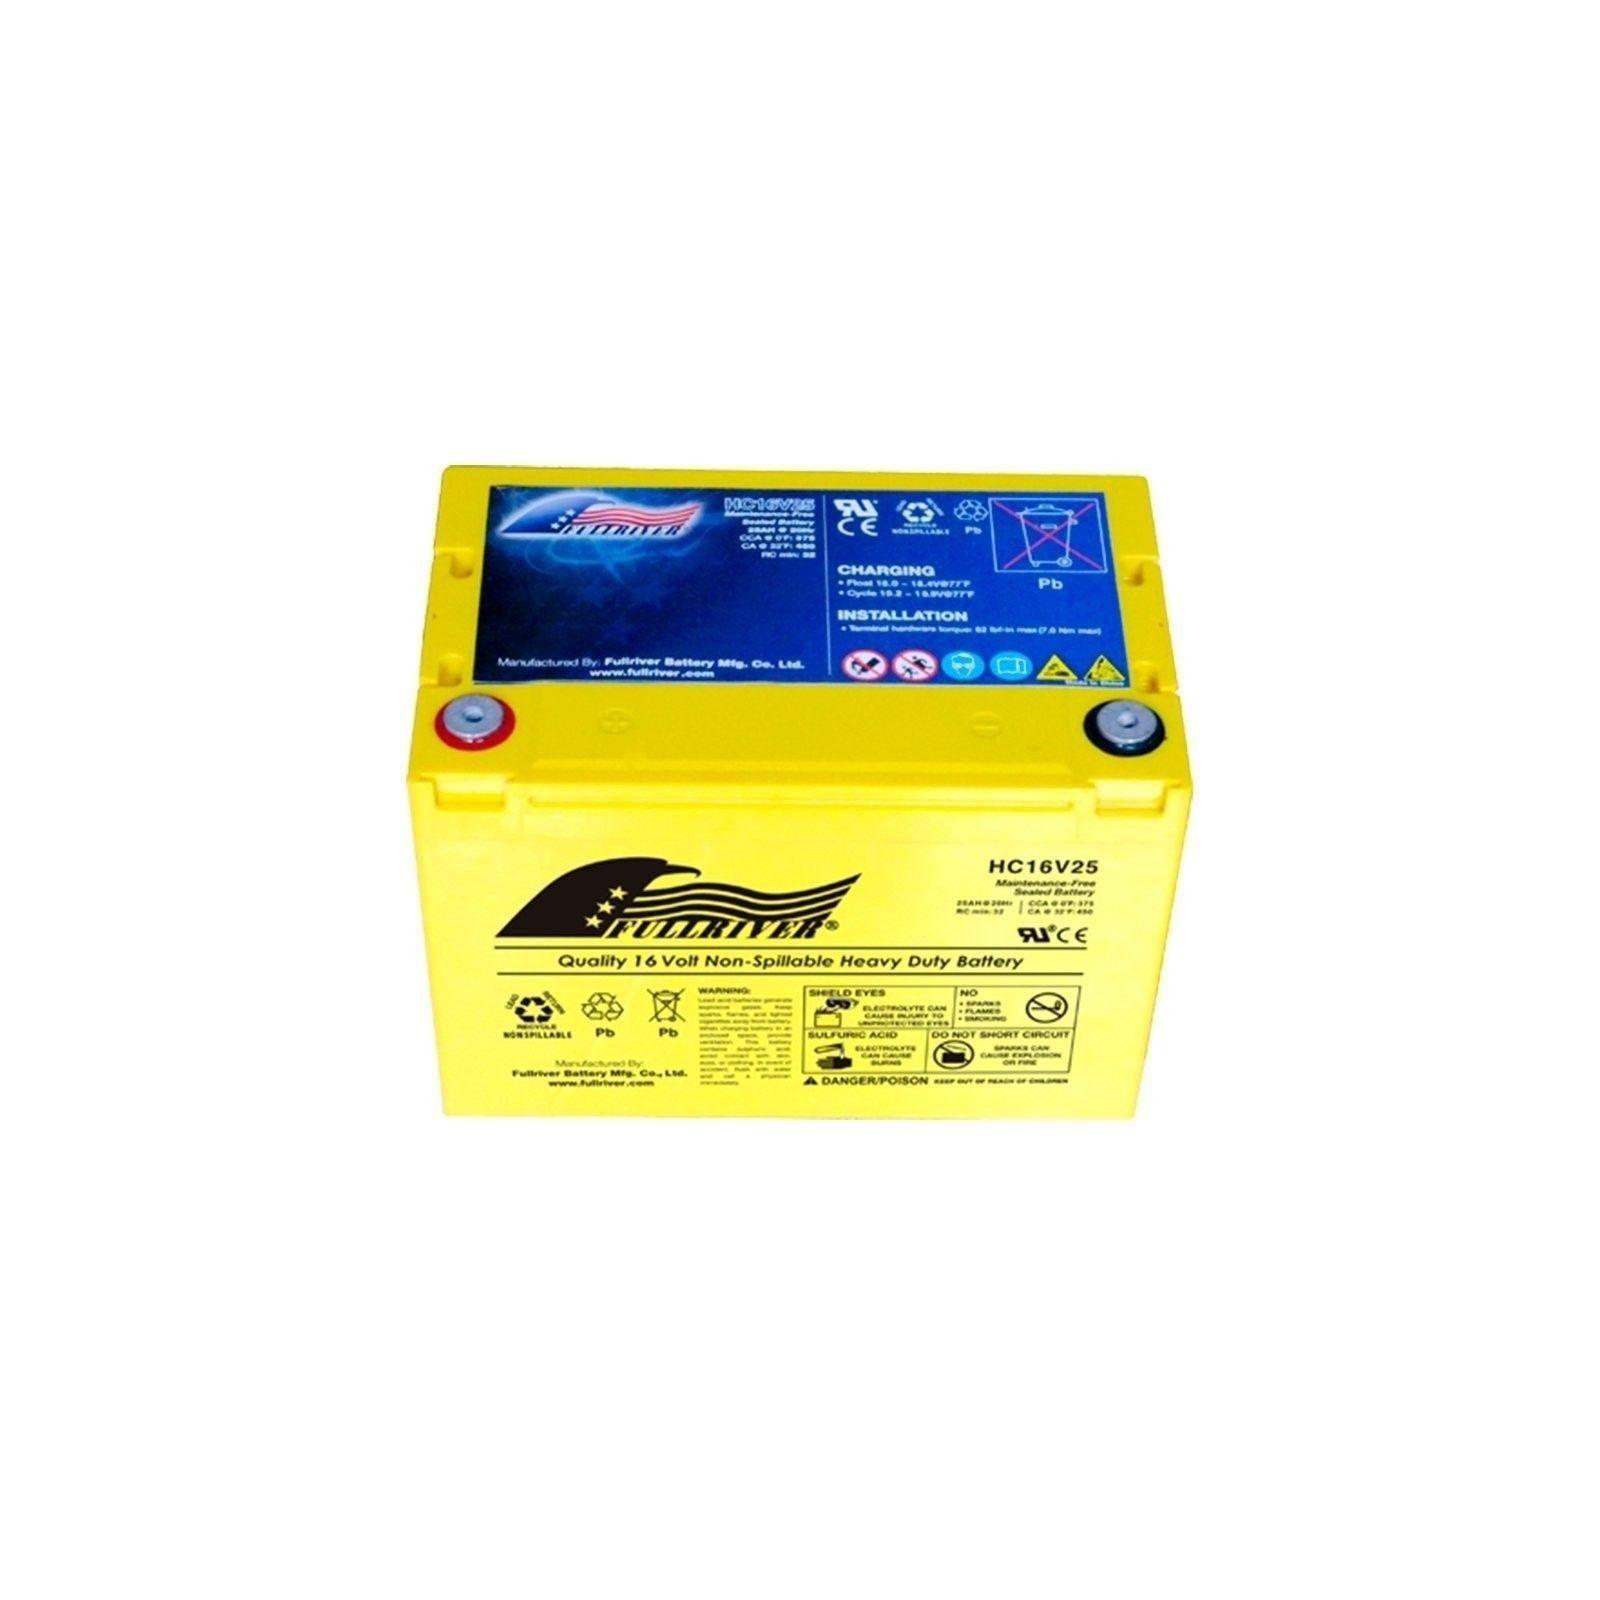 Battery Fullriver HC16V25 25Ah 375A 16V Hc FULLRIVER - 1